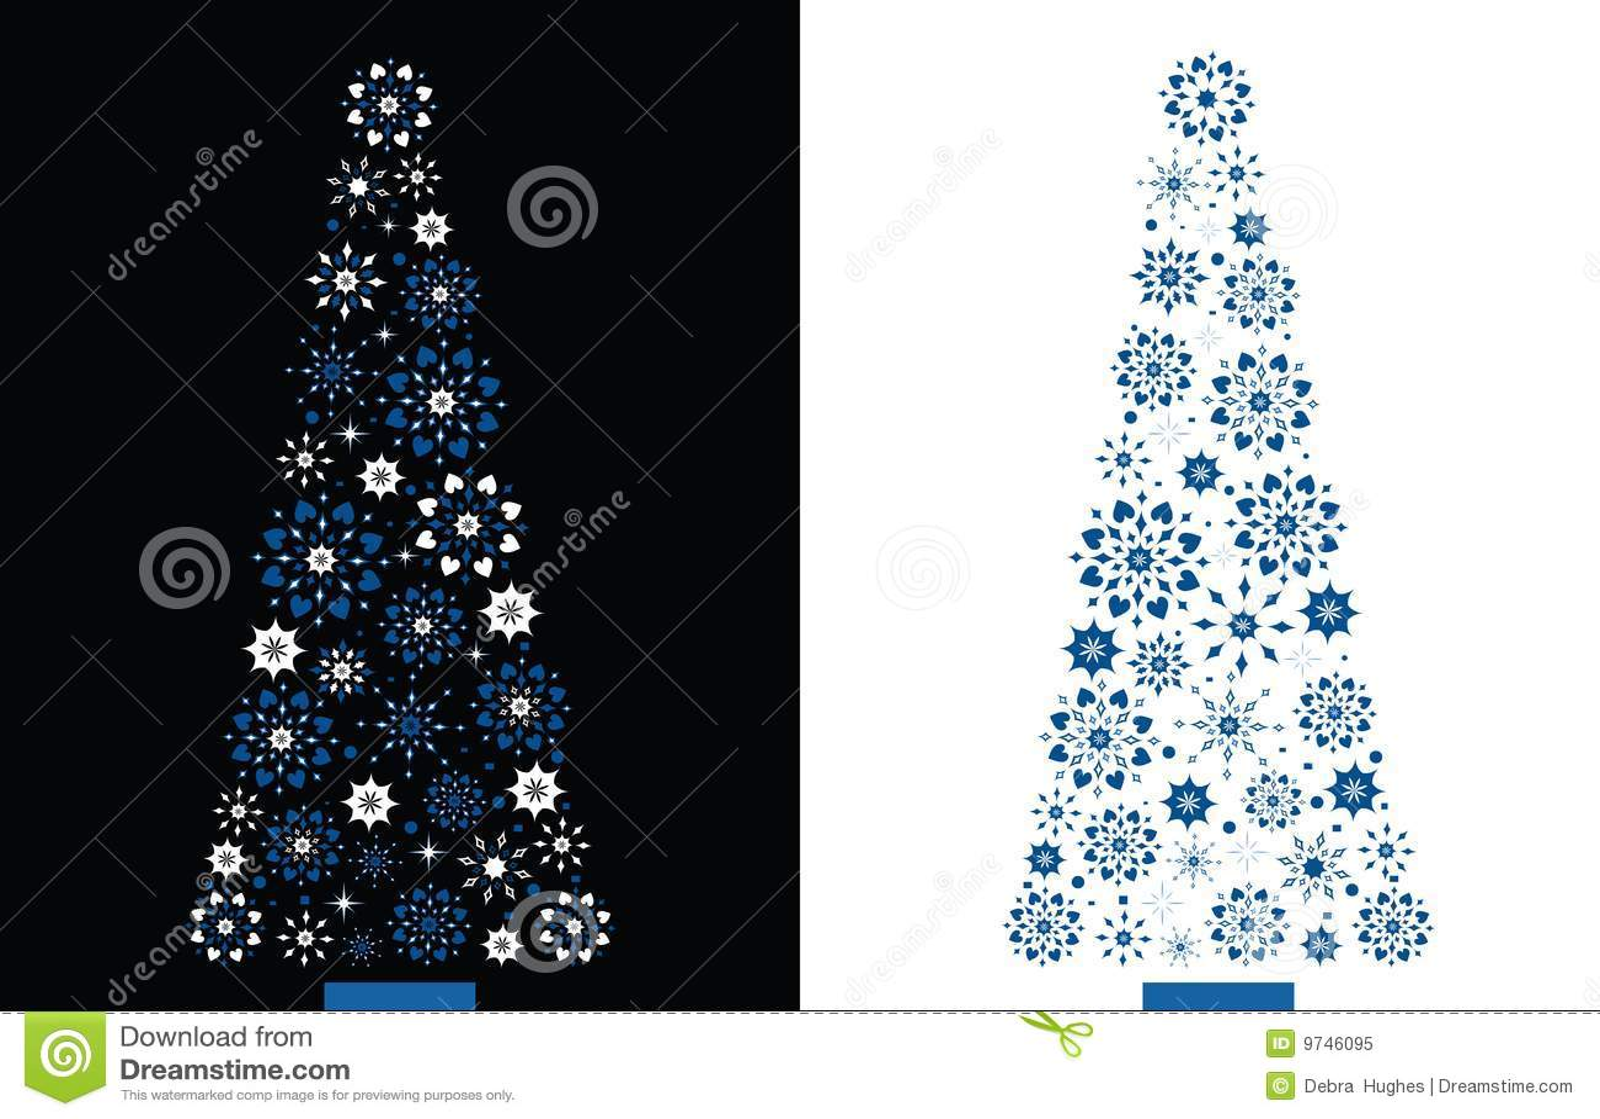 Dimond Shape Snowflake Christmas Tree Royalty Free Stock Photo ...